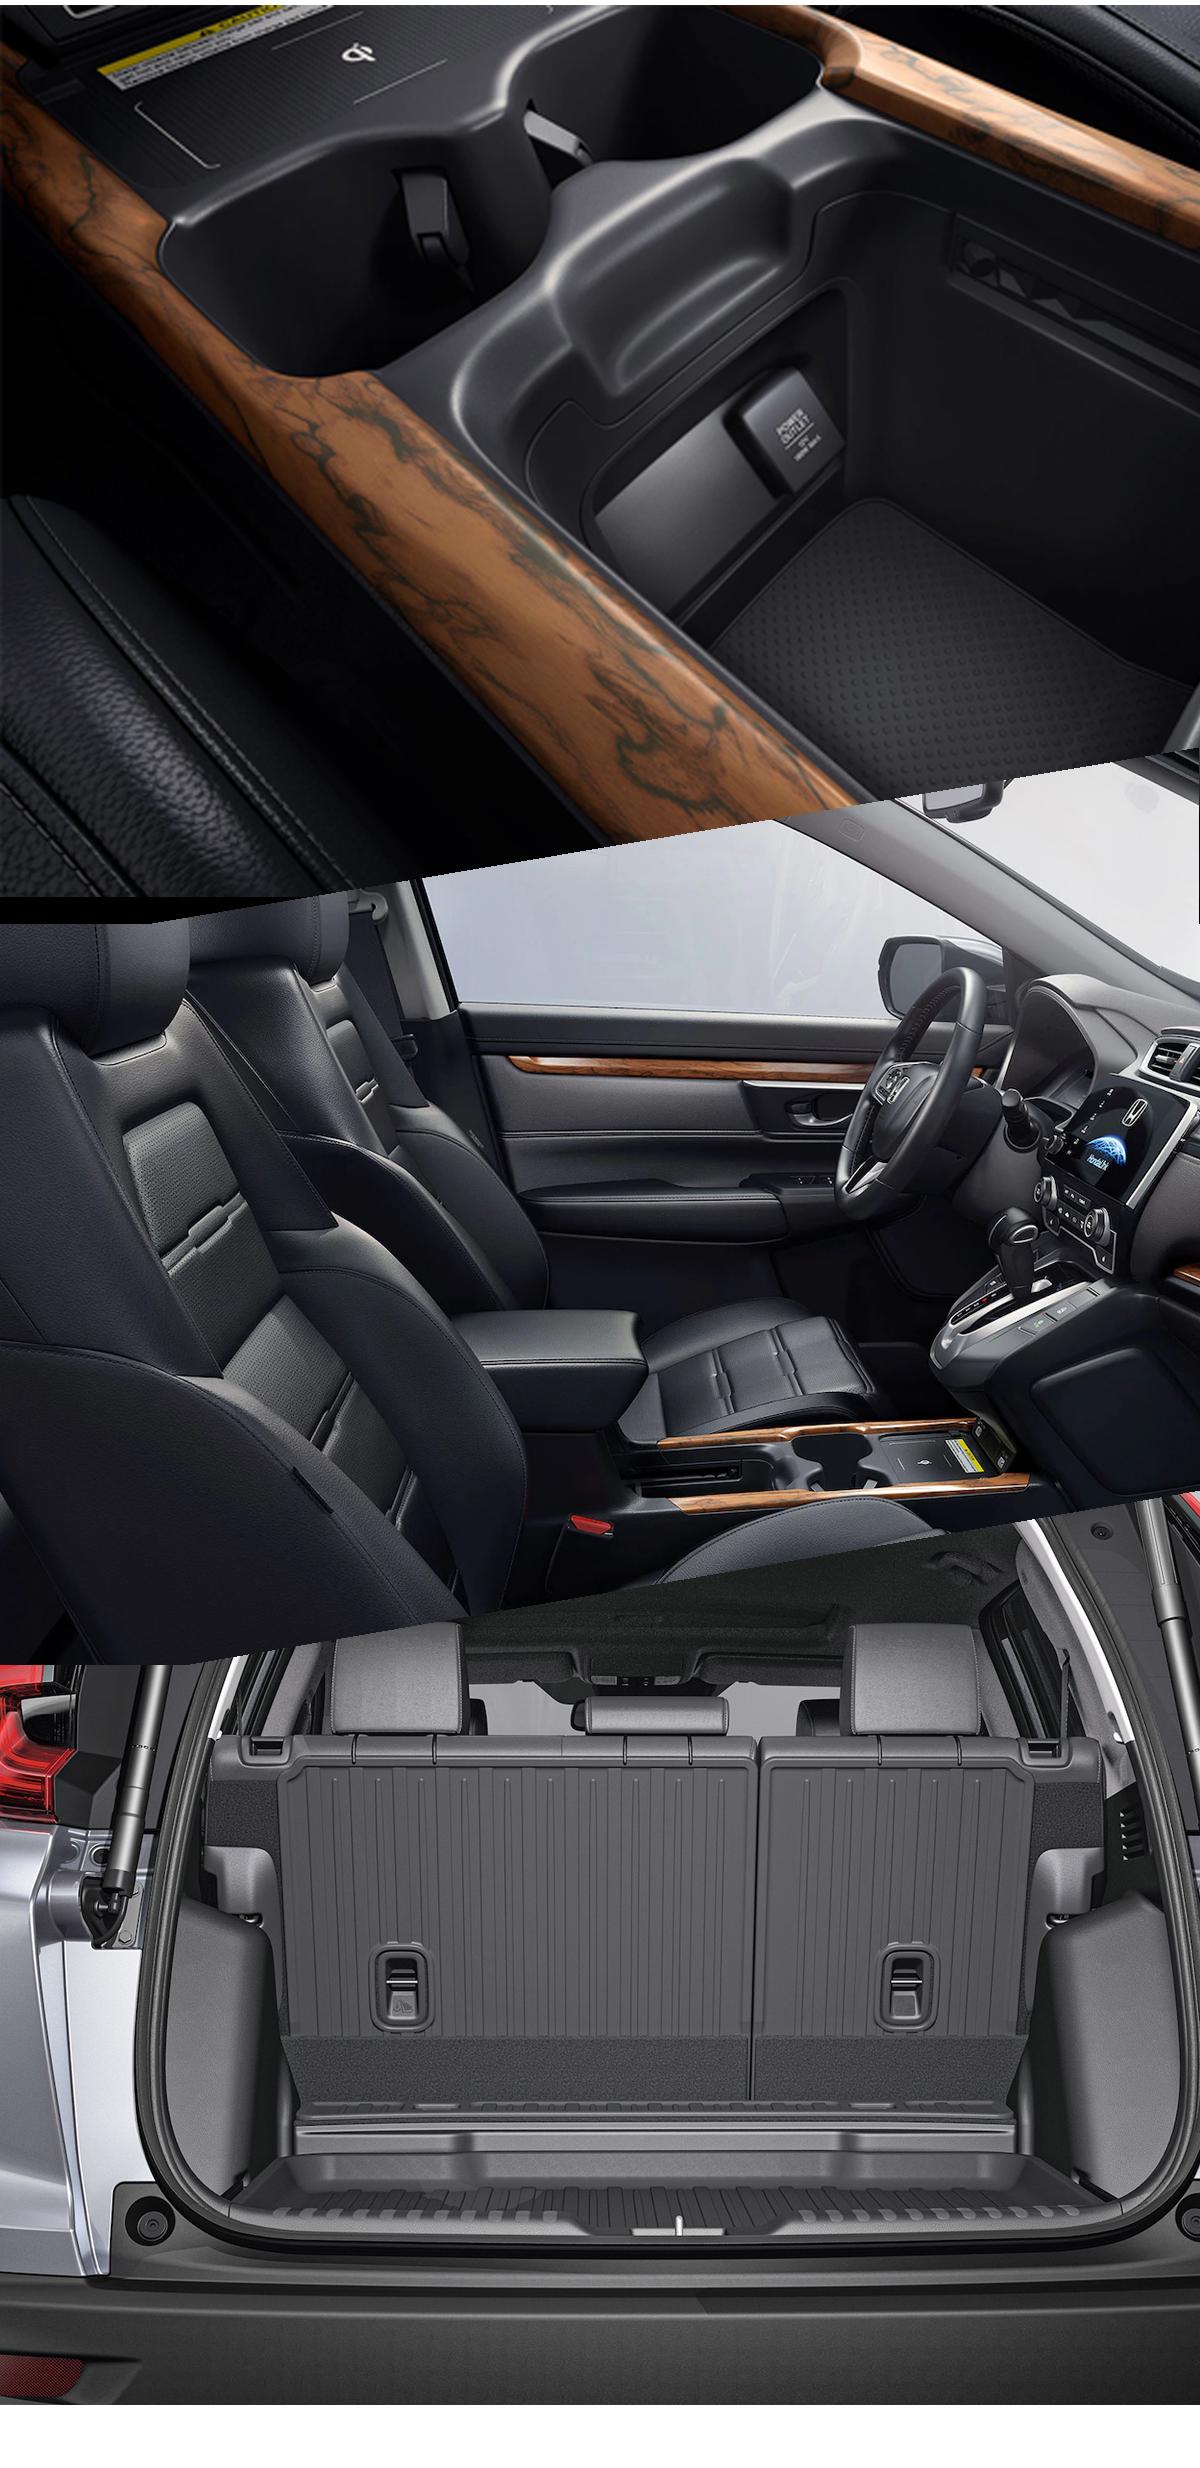 2021 Honda CR-V Interior Images